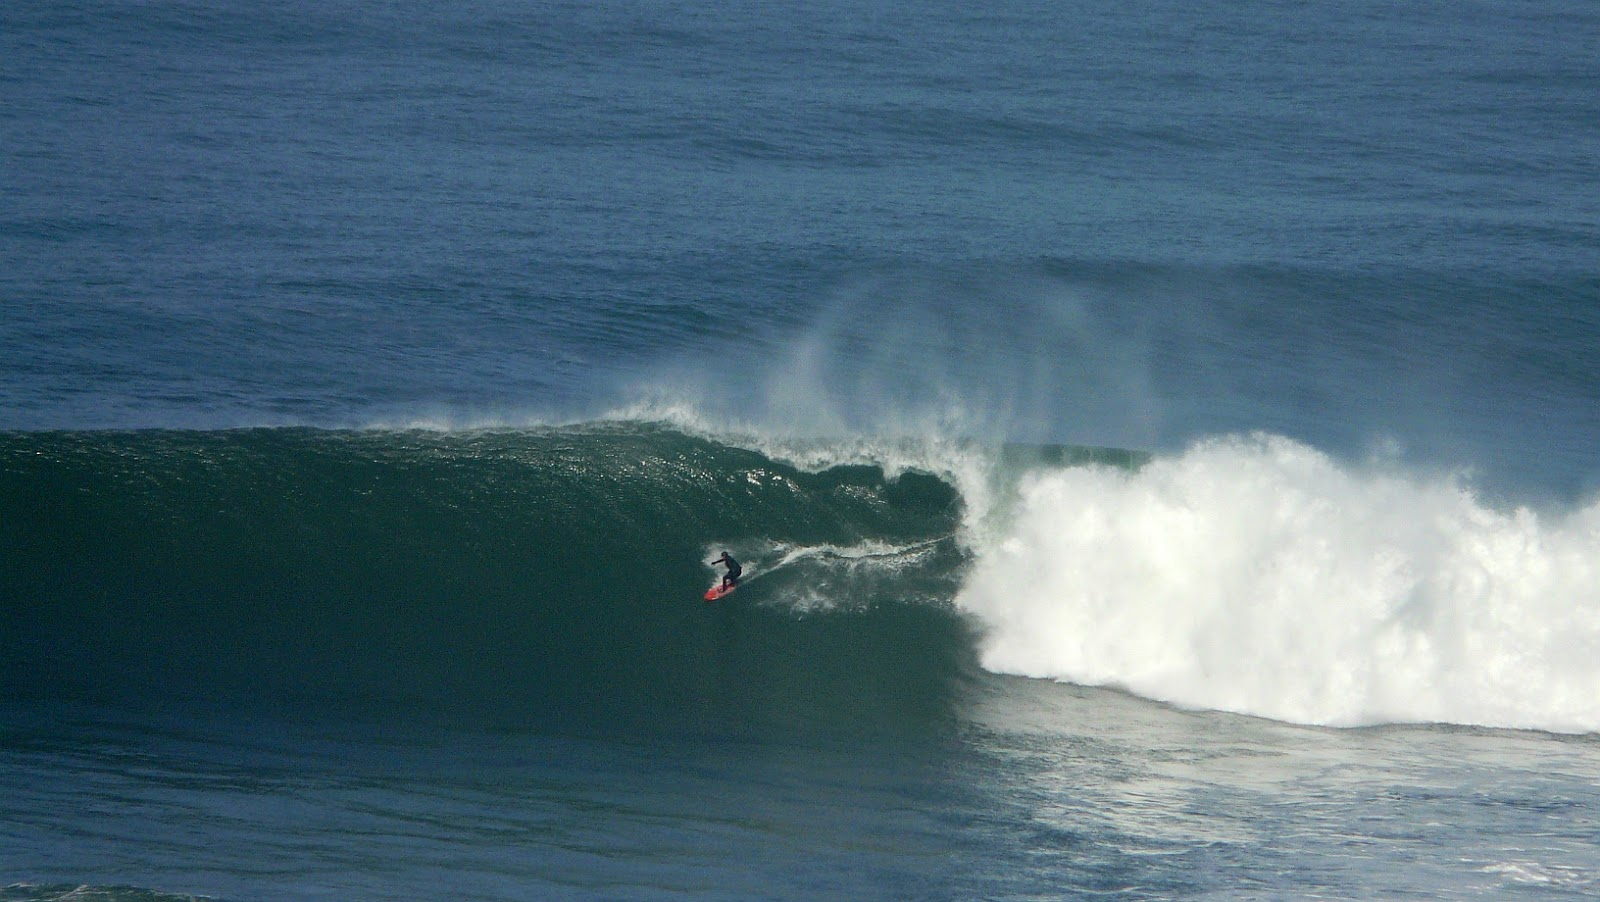 surf golf galea getxo bizkaia%2B%25282%2529